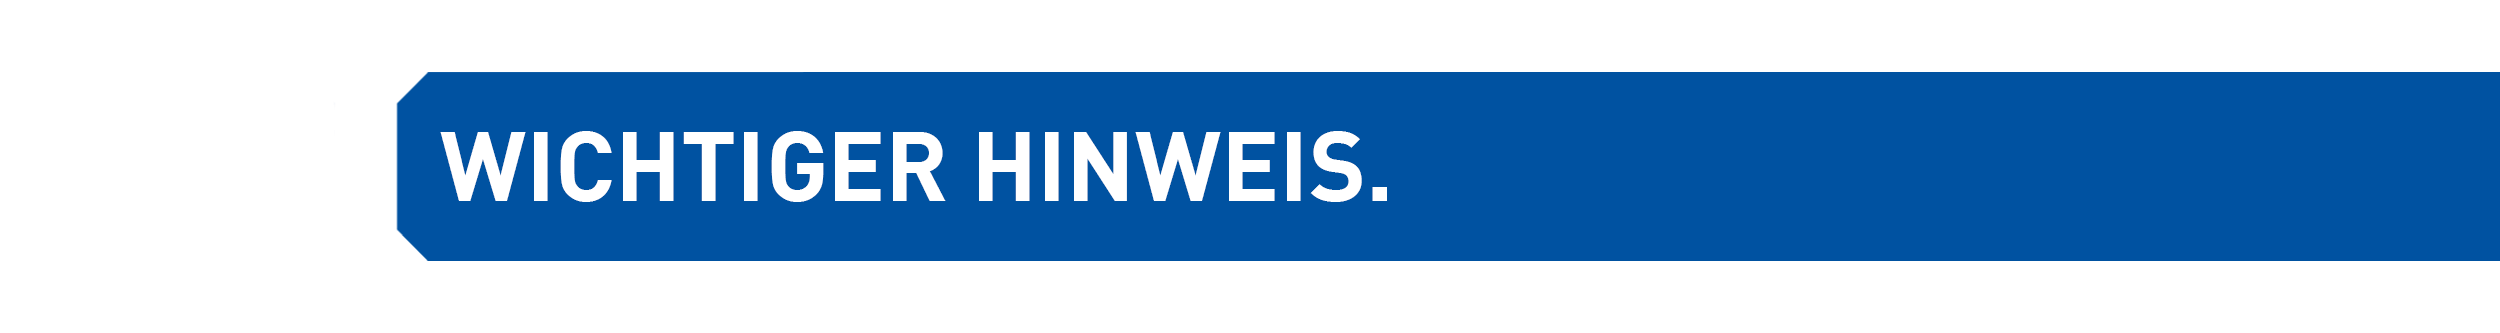 WICHTIGERHINWEIS